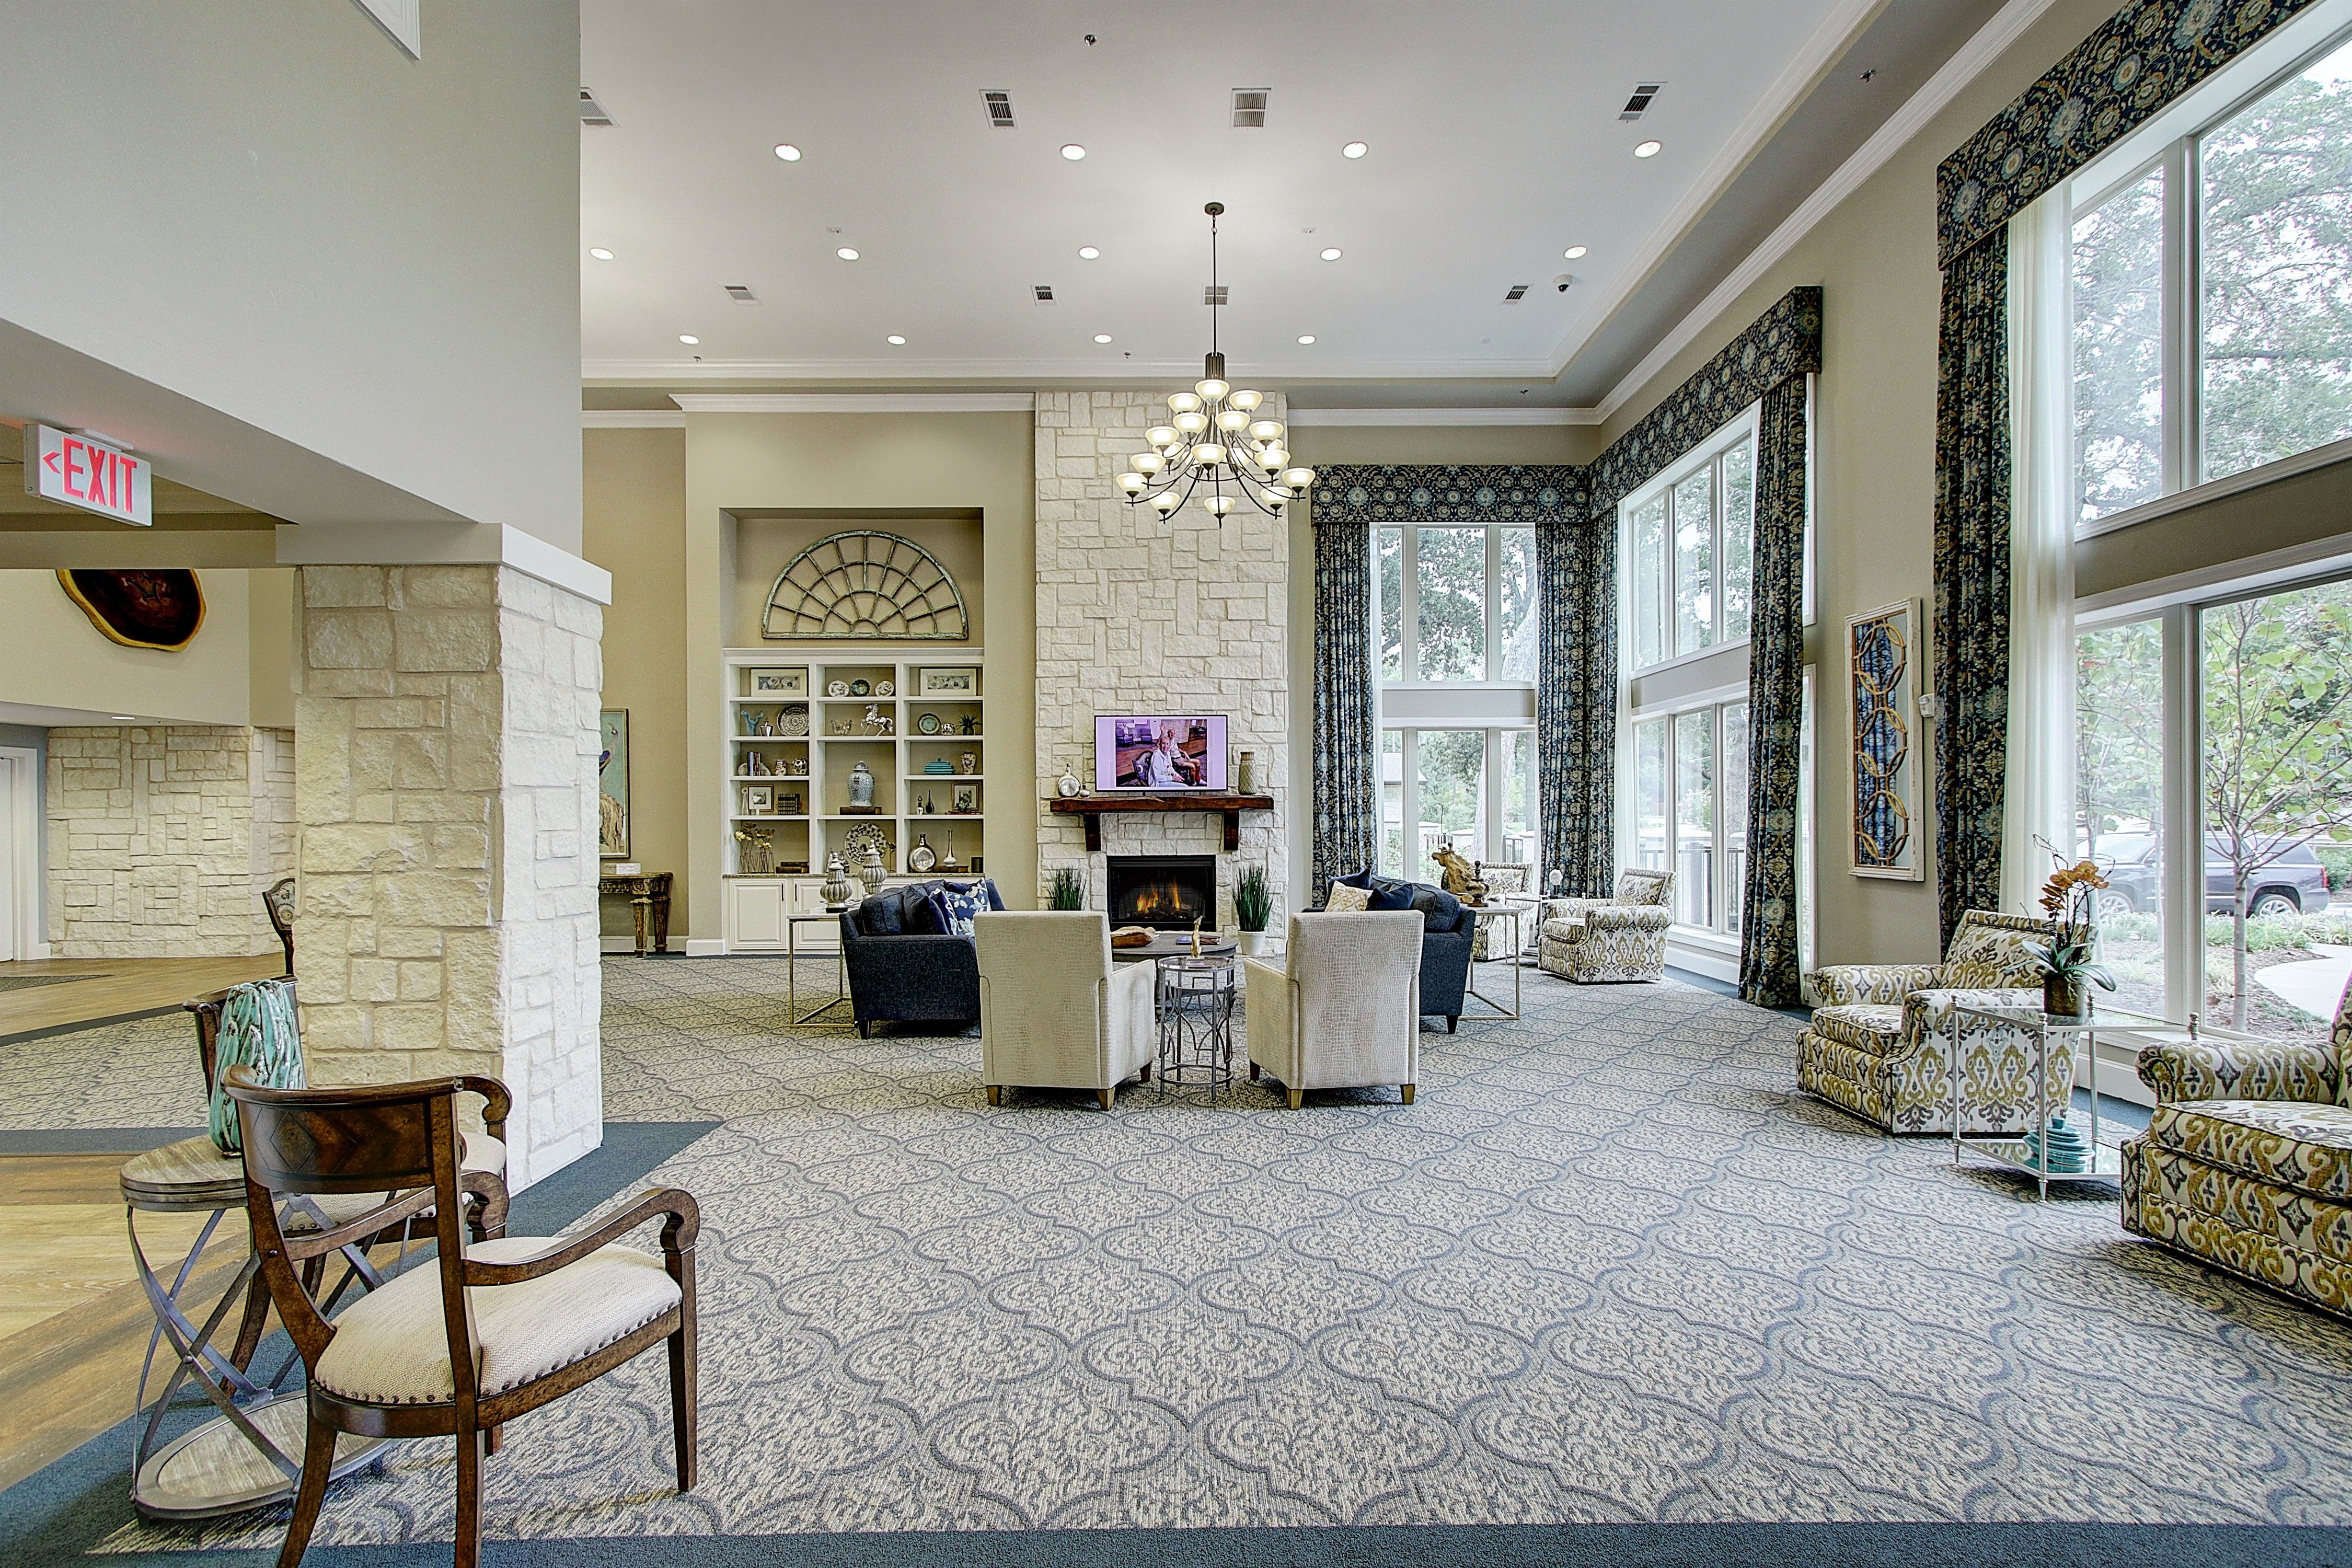 Testimonial Reviews For Assisted Living And Memory Care Cozy Interior Senior Living Floor To Ceiling Windows